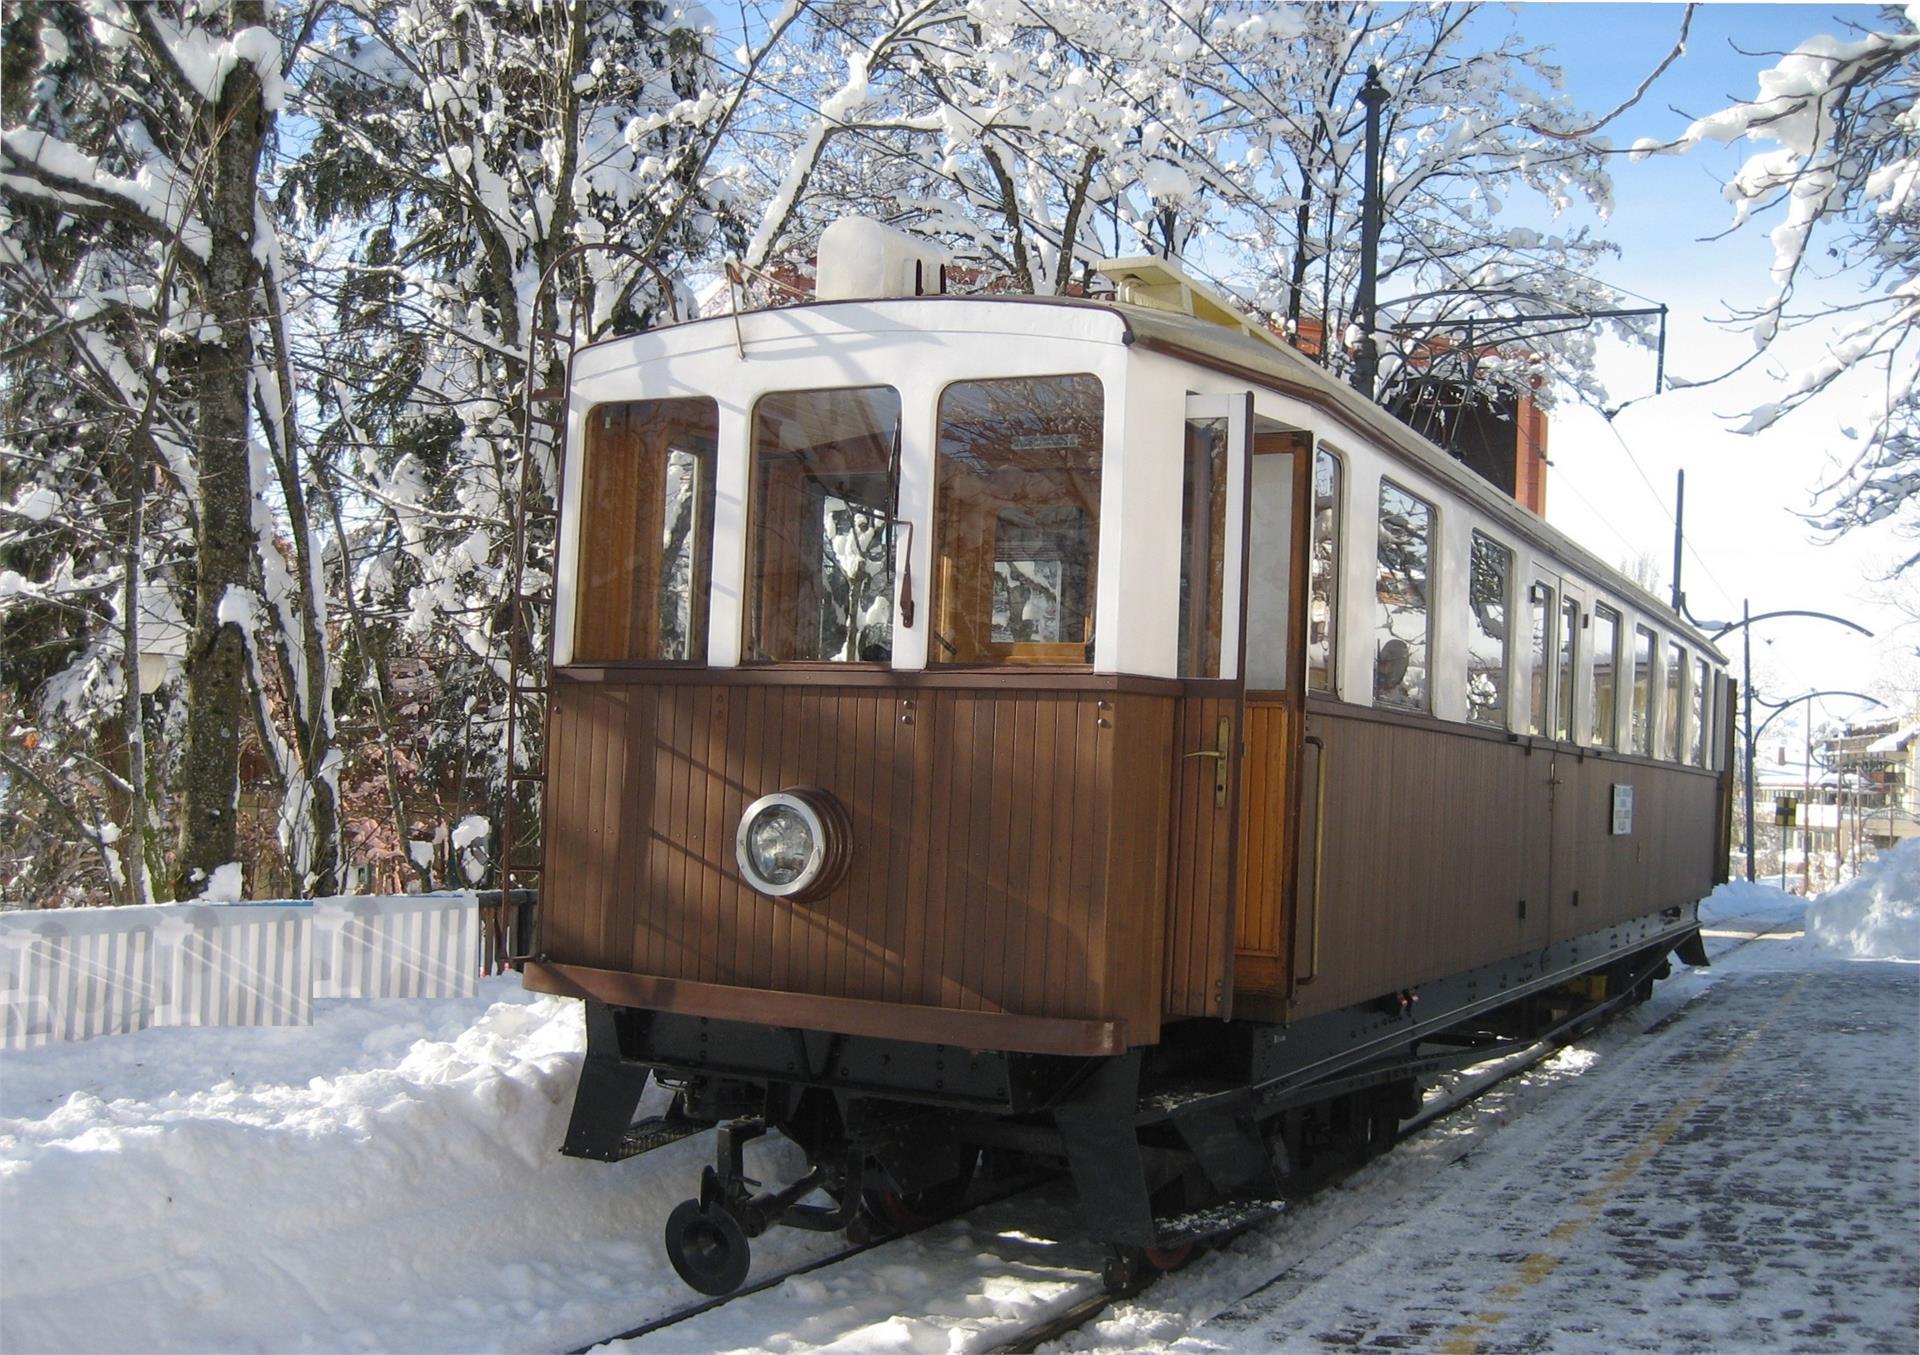 Rittnerbahn - Eisenbahn am Berg